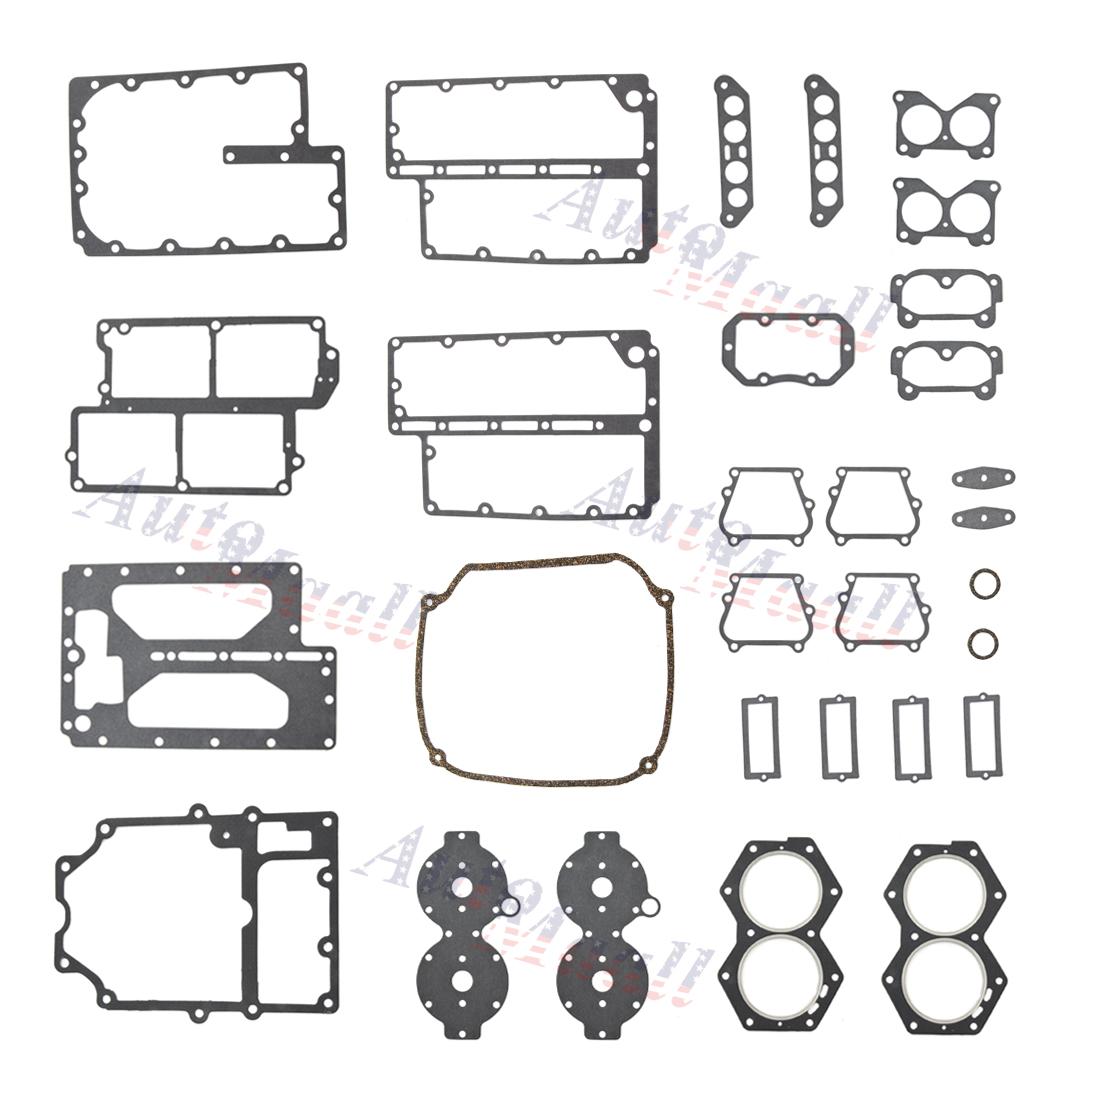 Powerhead Head Gasket Kit Set for Johnson/Evinrude